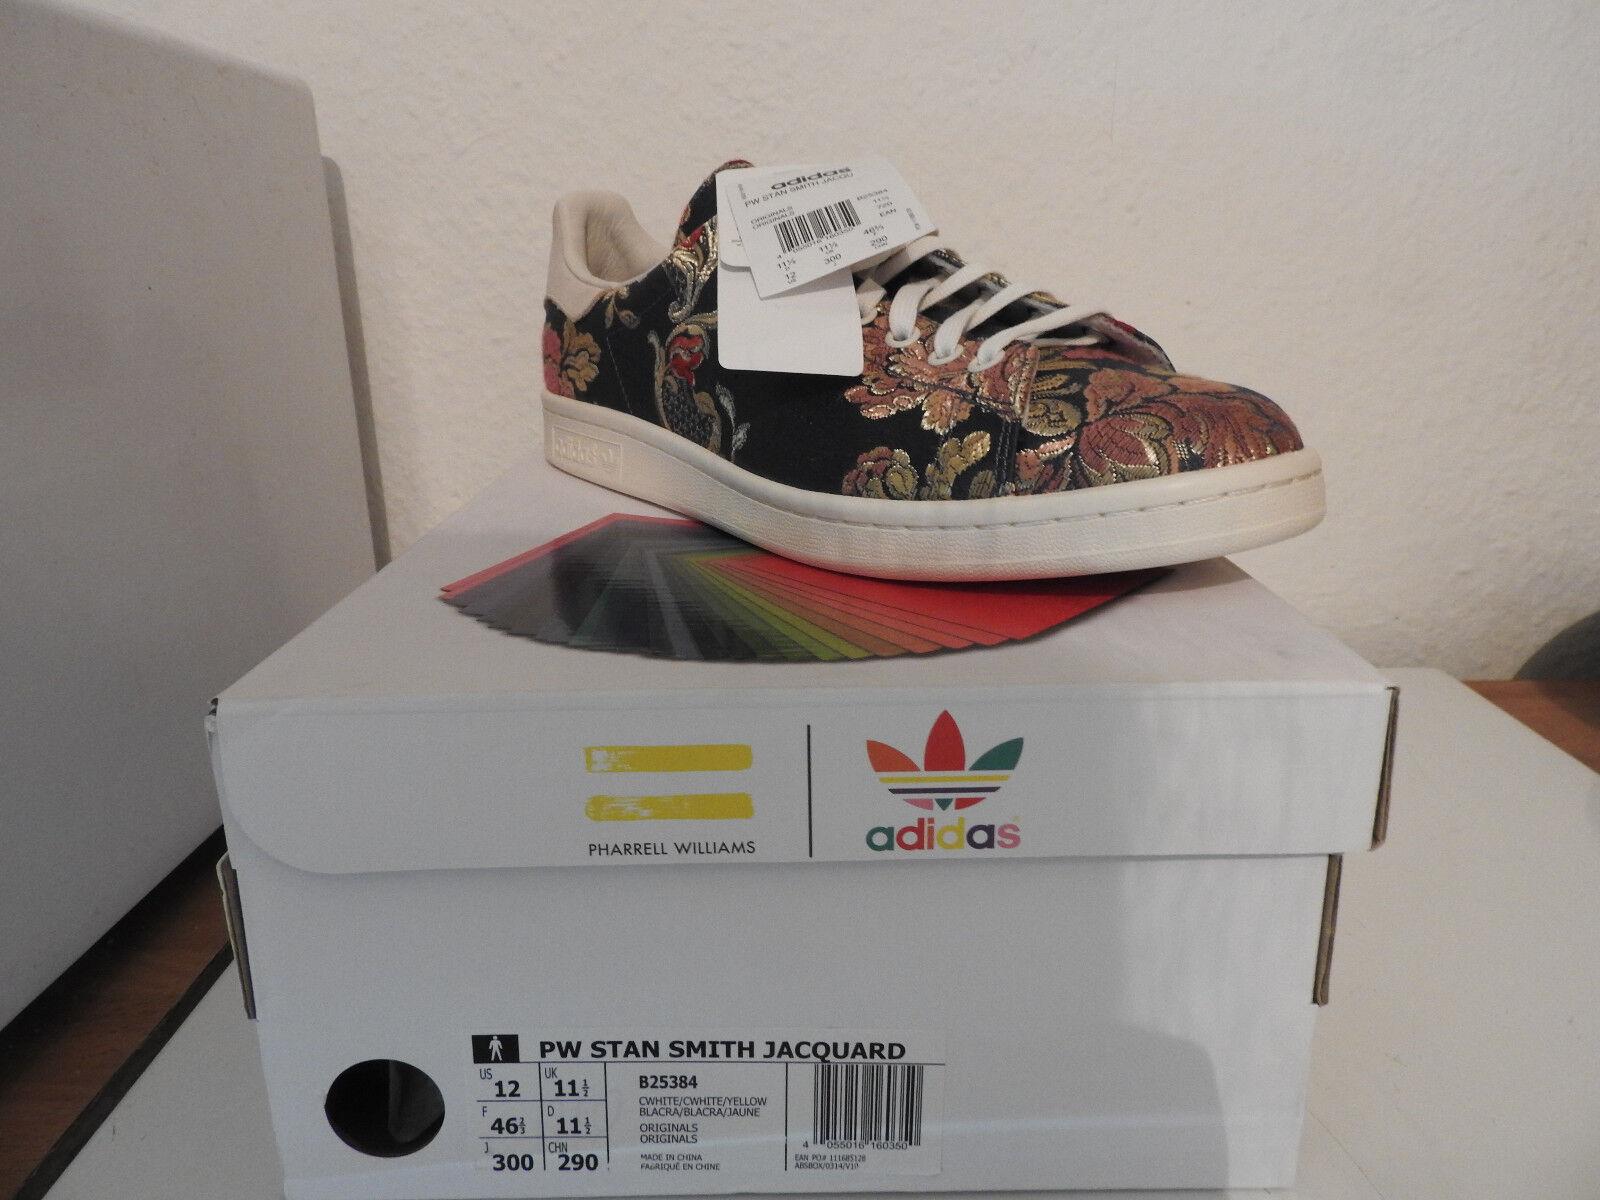 NEUF  Adidas X Pharrell Williams Stan Smith jacquard taille US 12 (46 2/3) b25384